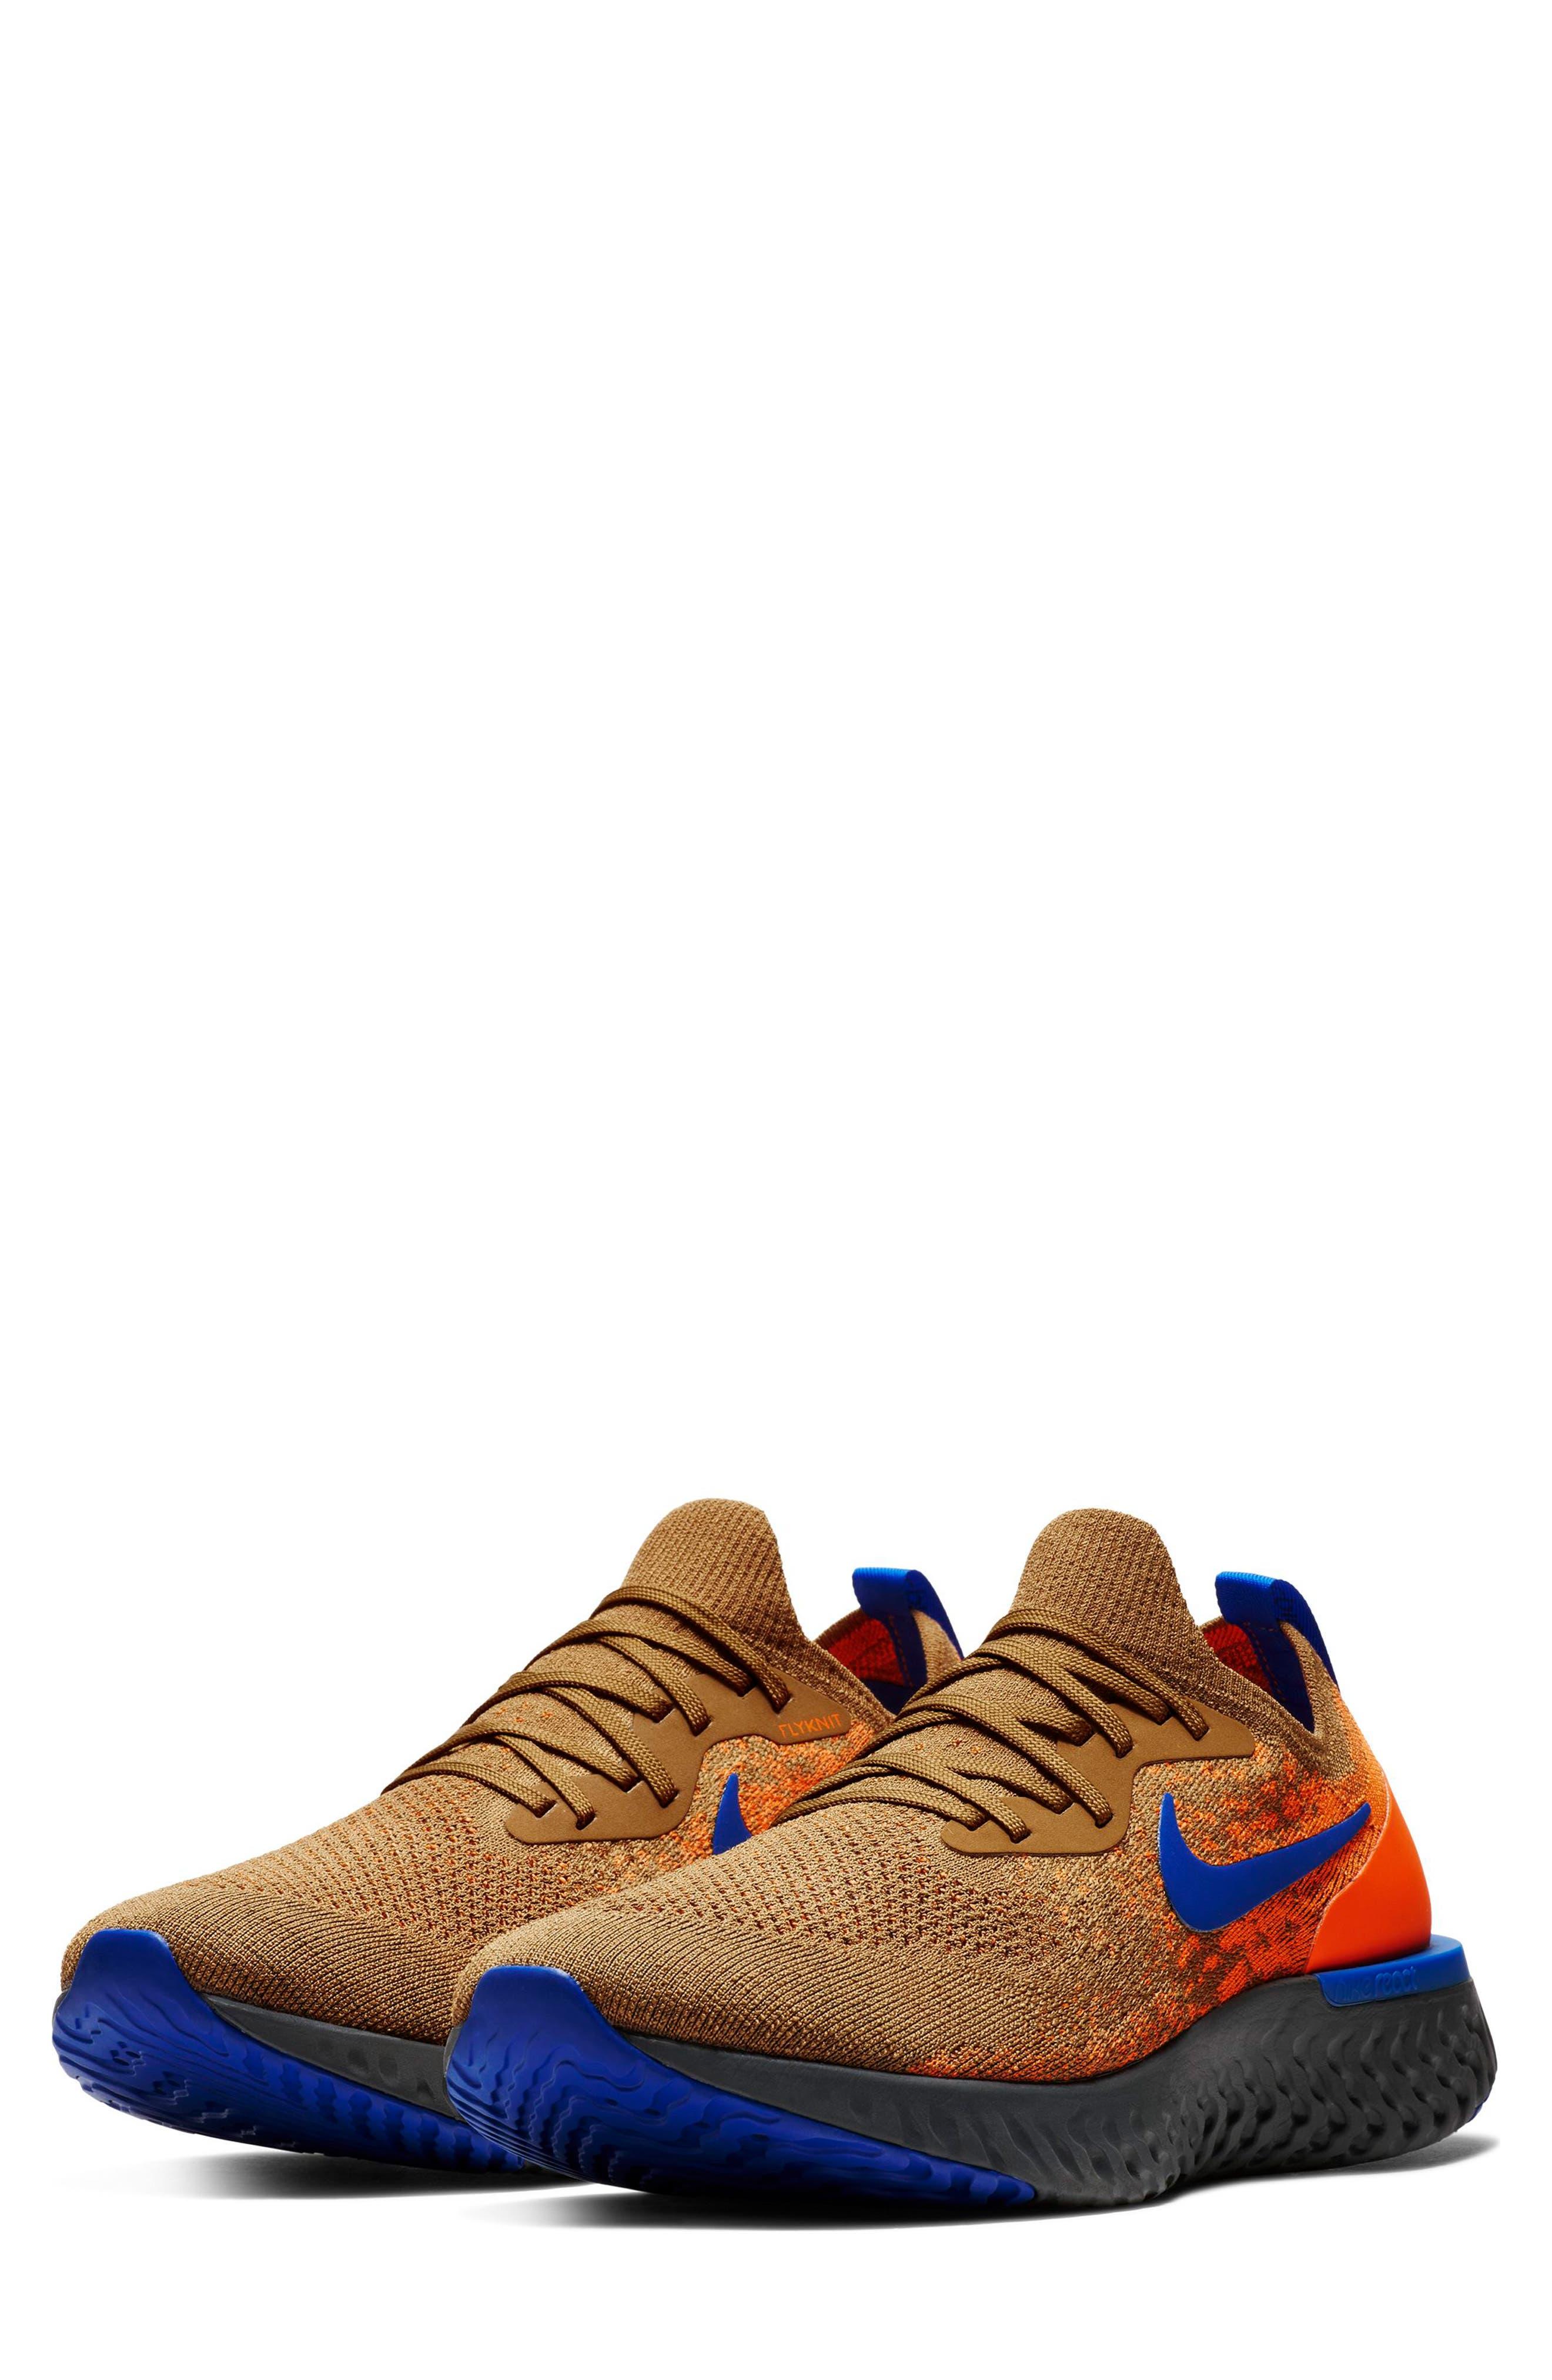 Epic React Flyknit Running Shoe,                         Main,                         color, GOLDEN BEIGE/ BLUE/ ORANGE